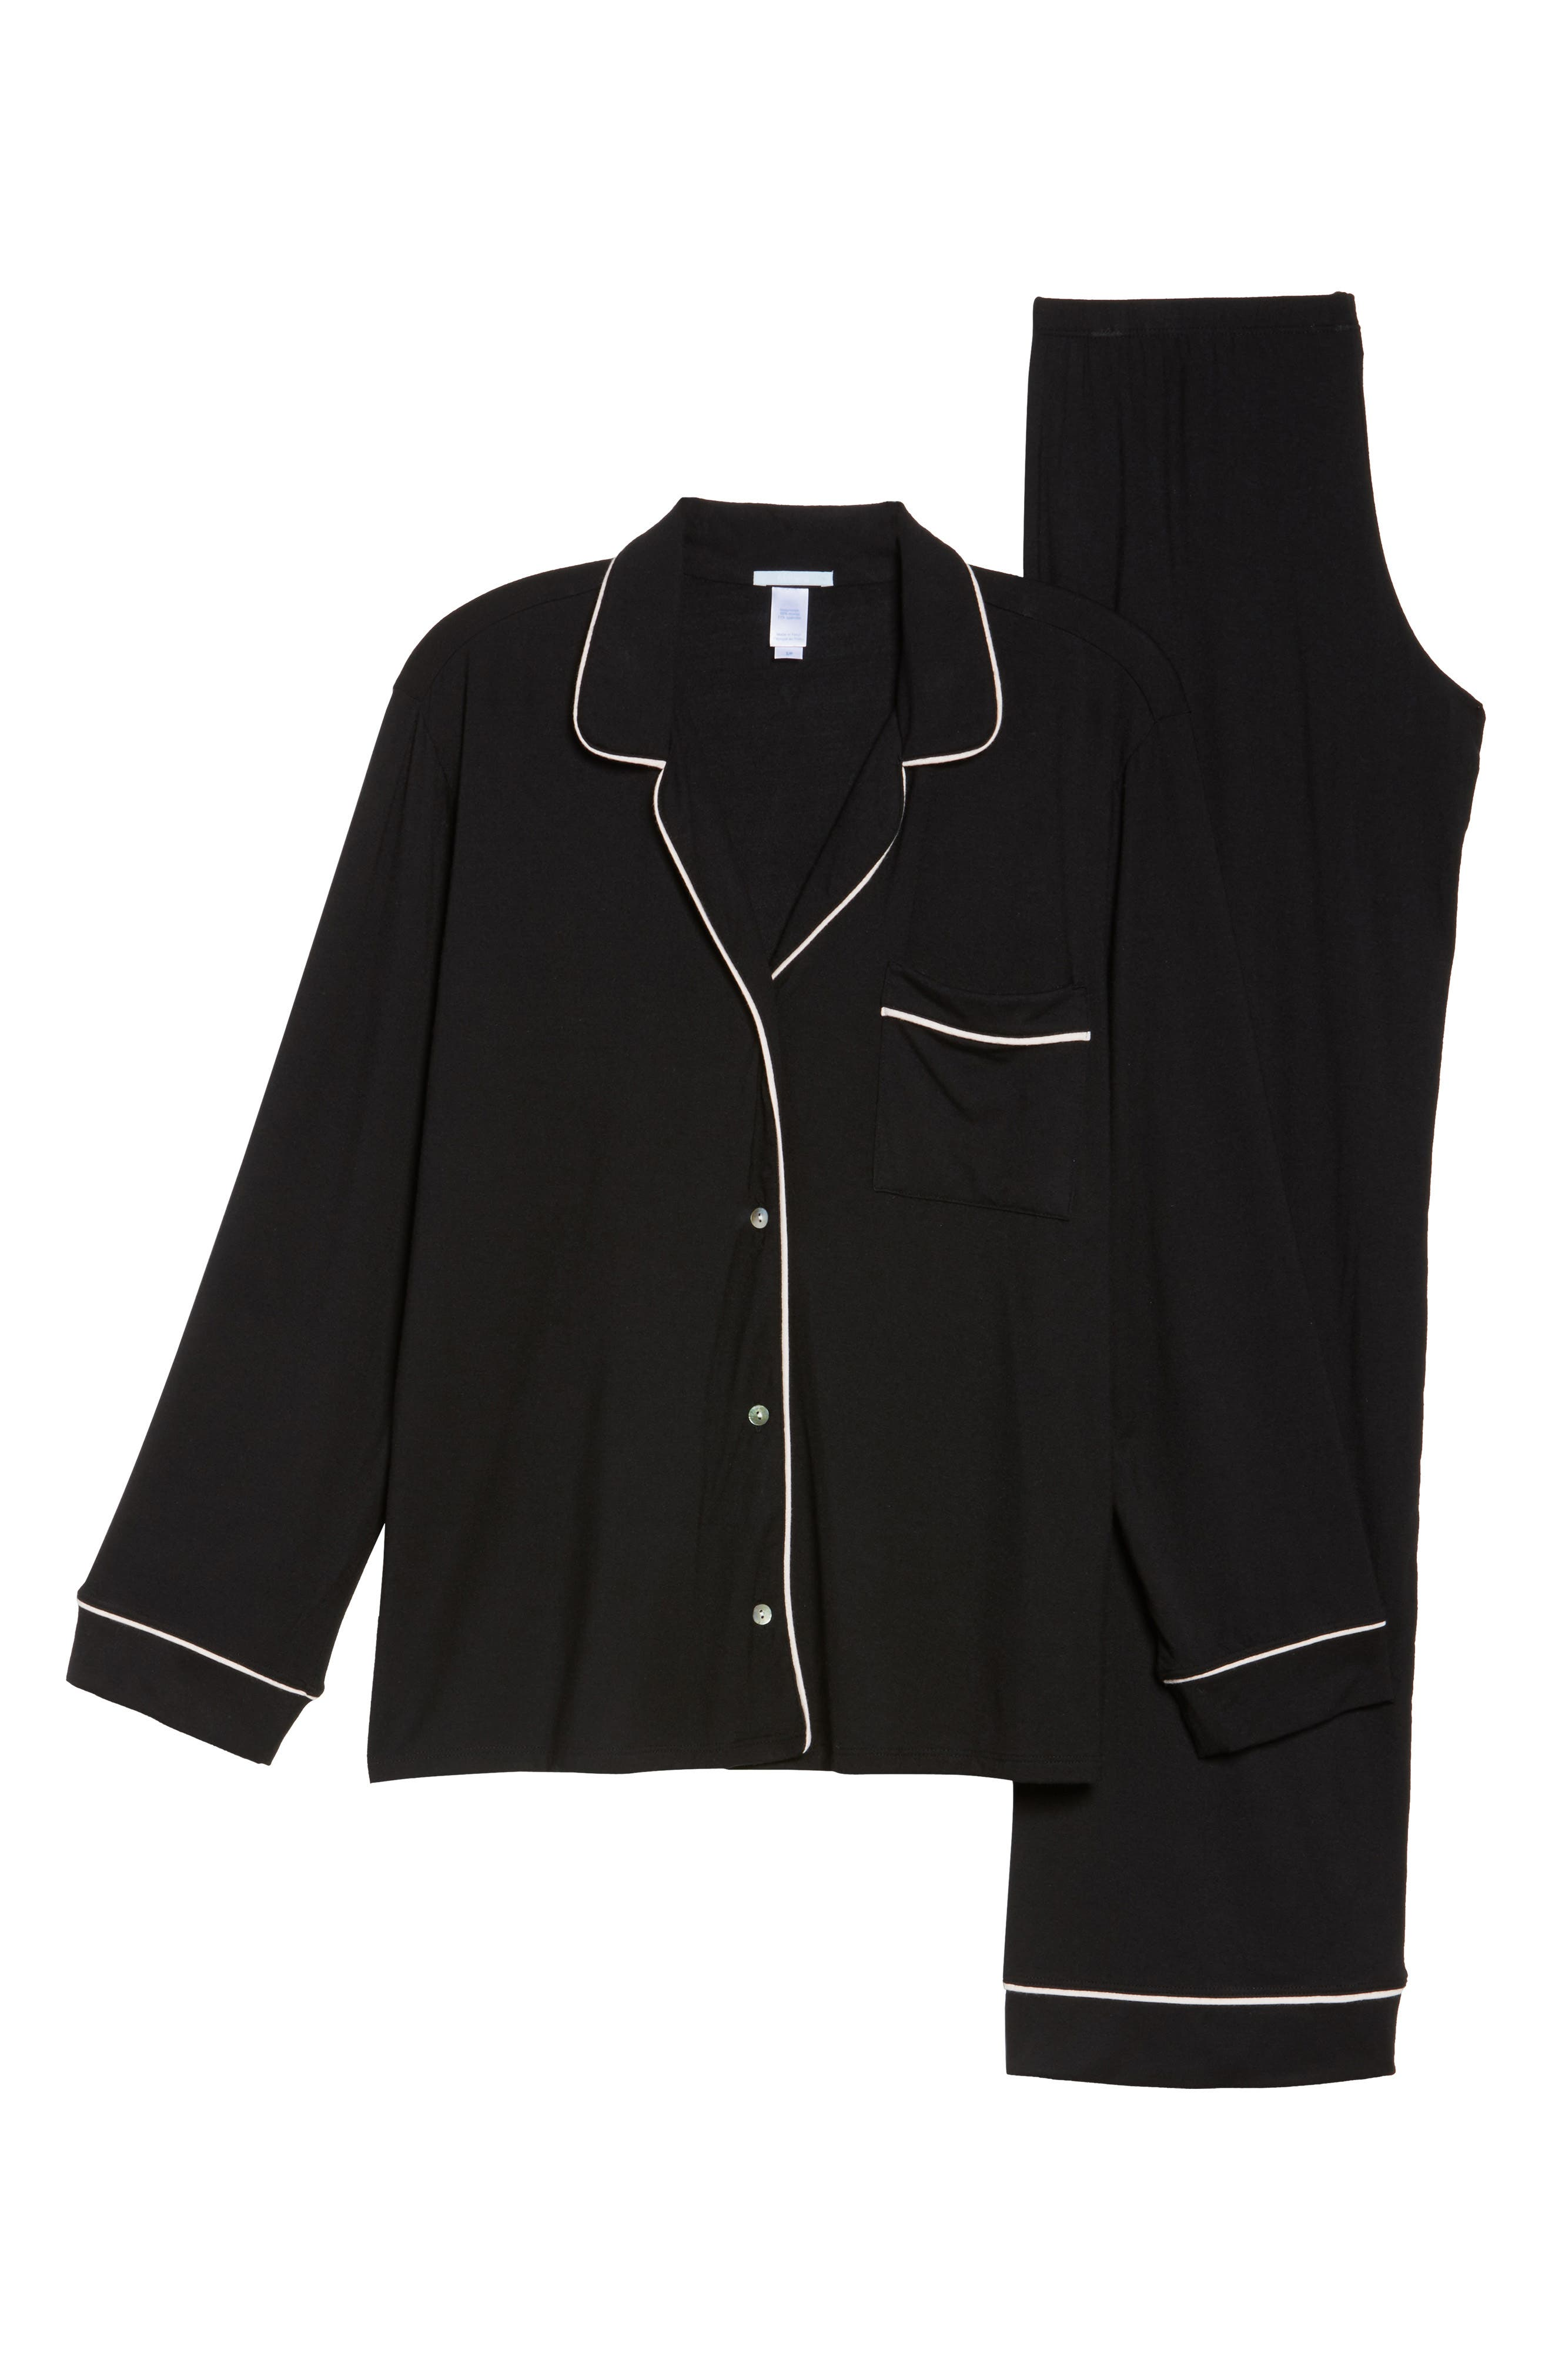 'Giselle' Pajamas,                             Alternate thumbnail 7, color,                             BLACK/ SORBET PINK